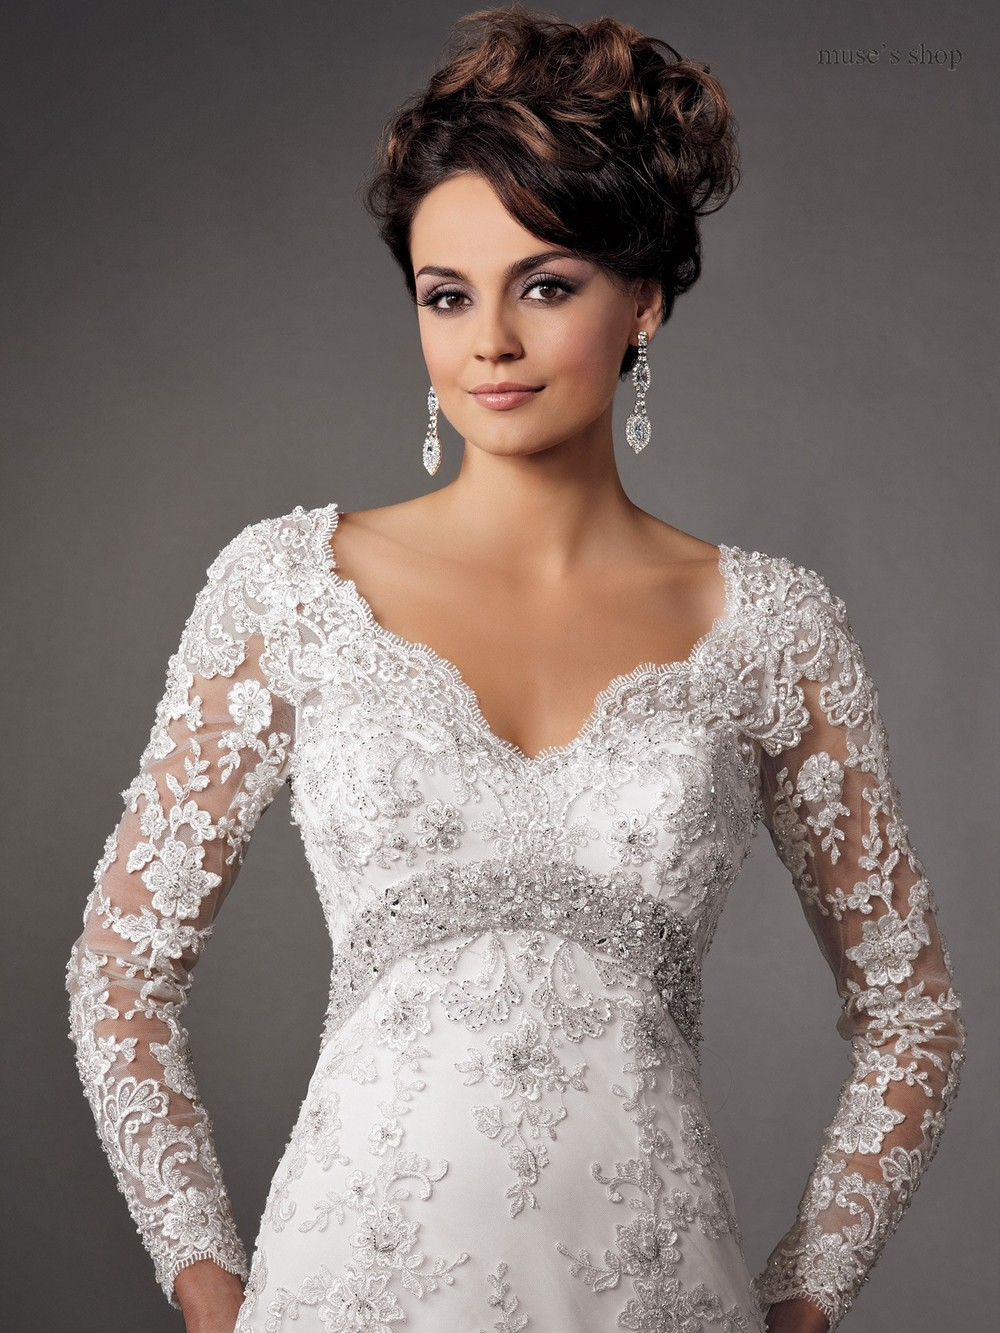 cheap petite wedding dresses uk wedding dresses for petite Cheap Petite Wedding Dresses Uk 62